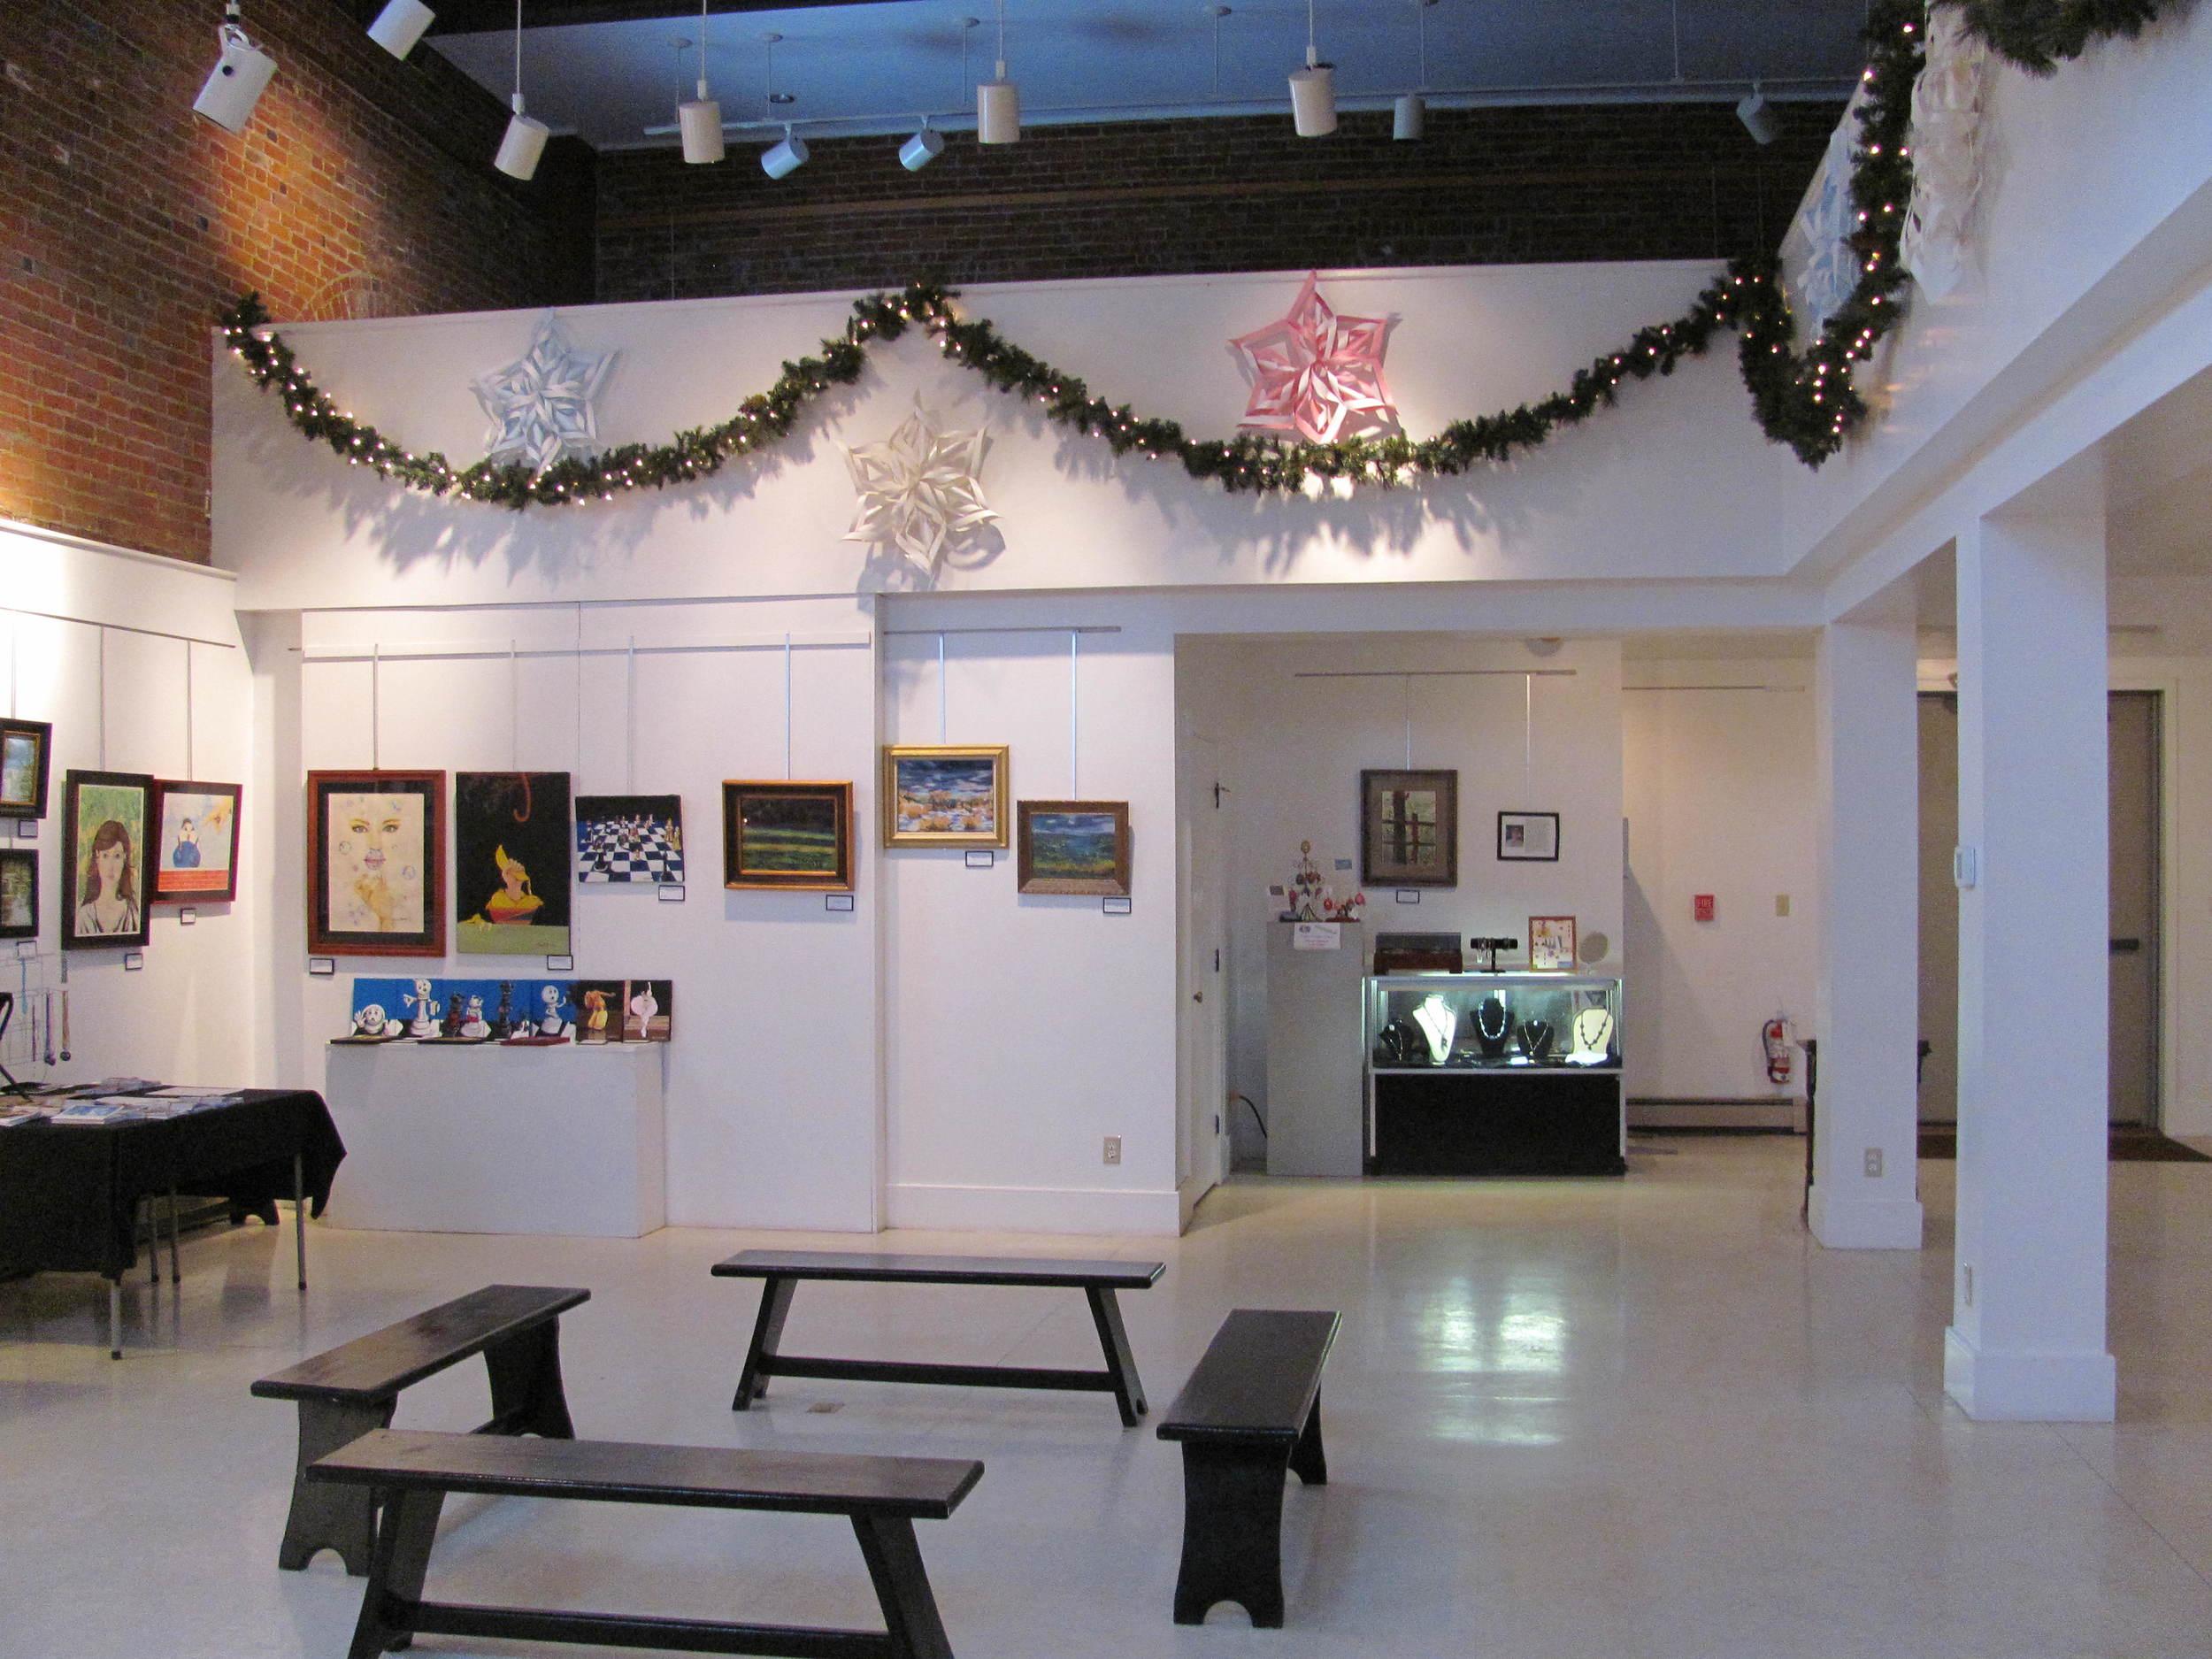 Gallery photos 004.JPG